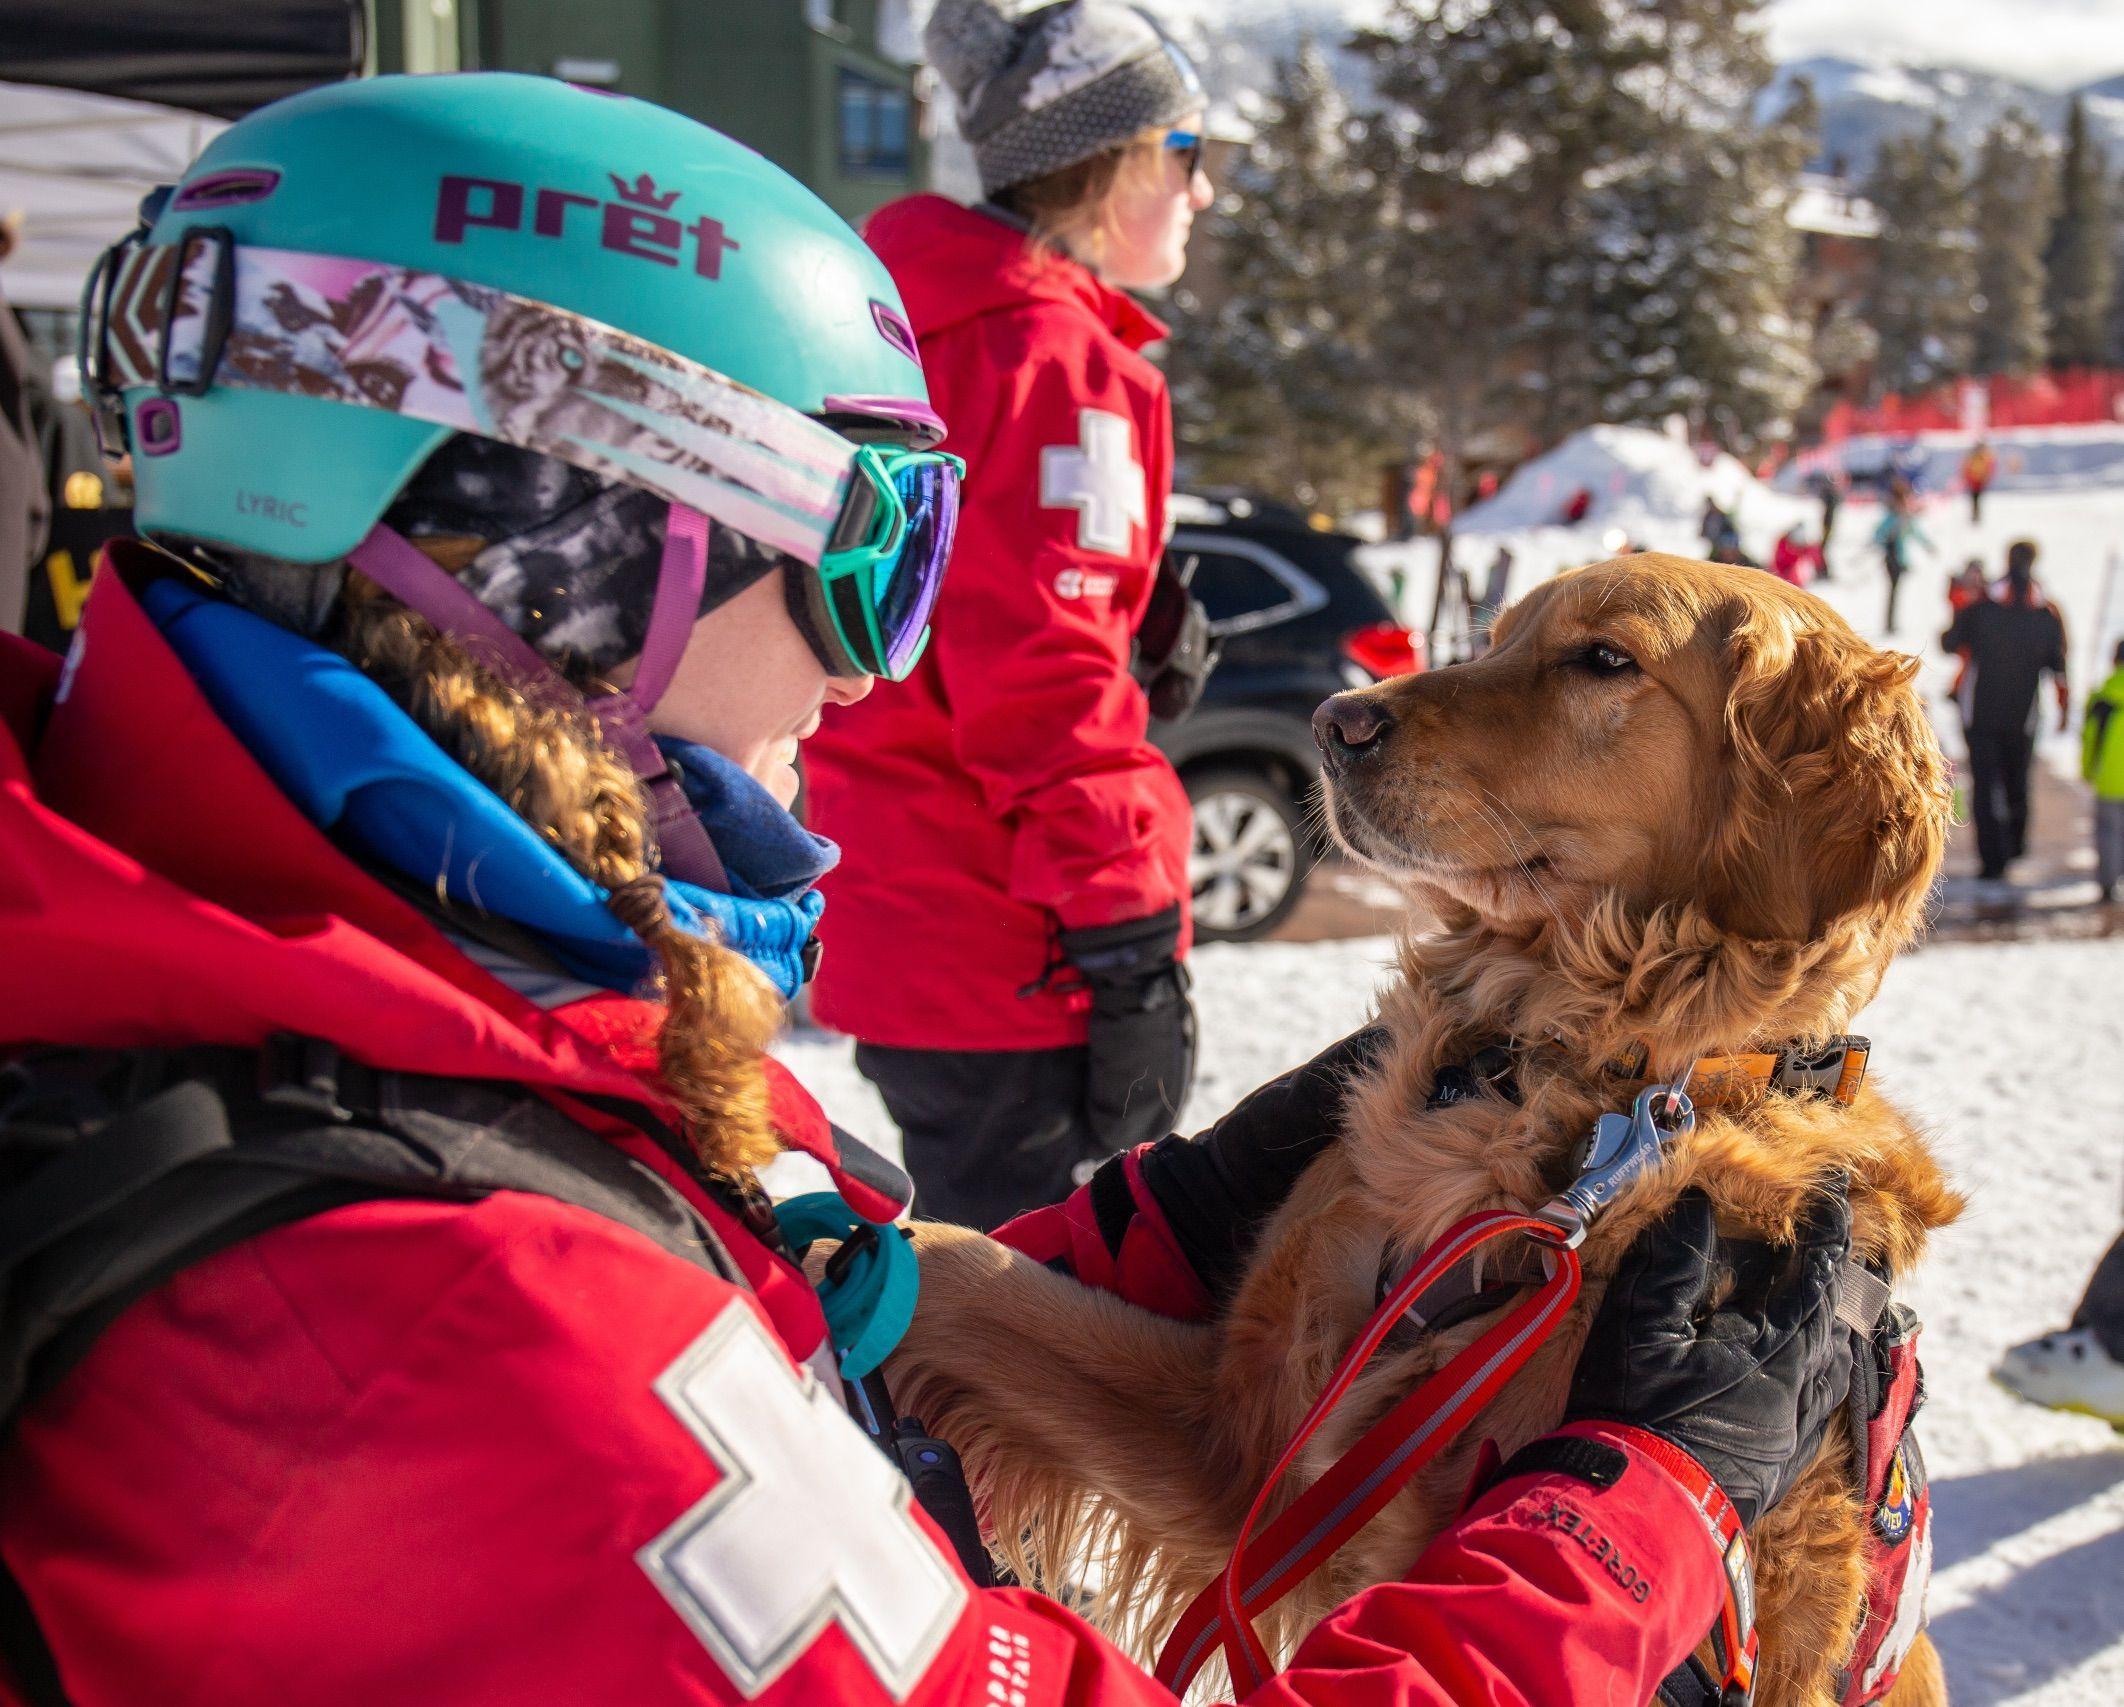 Ski Patrol Copper Mountain Colorado Safety Emt Medic Skiing